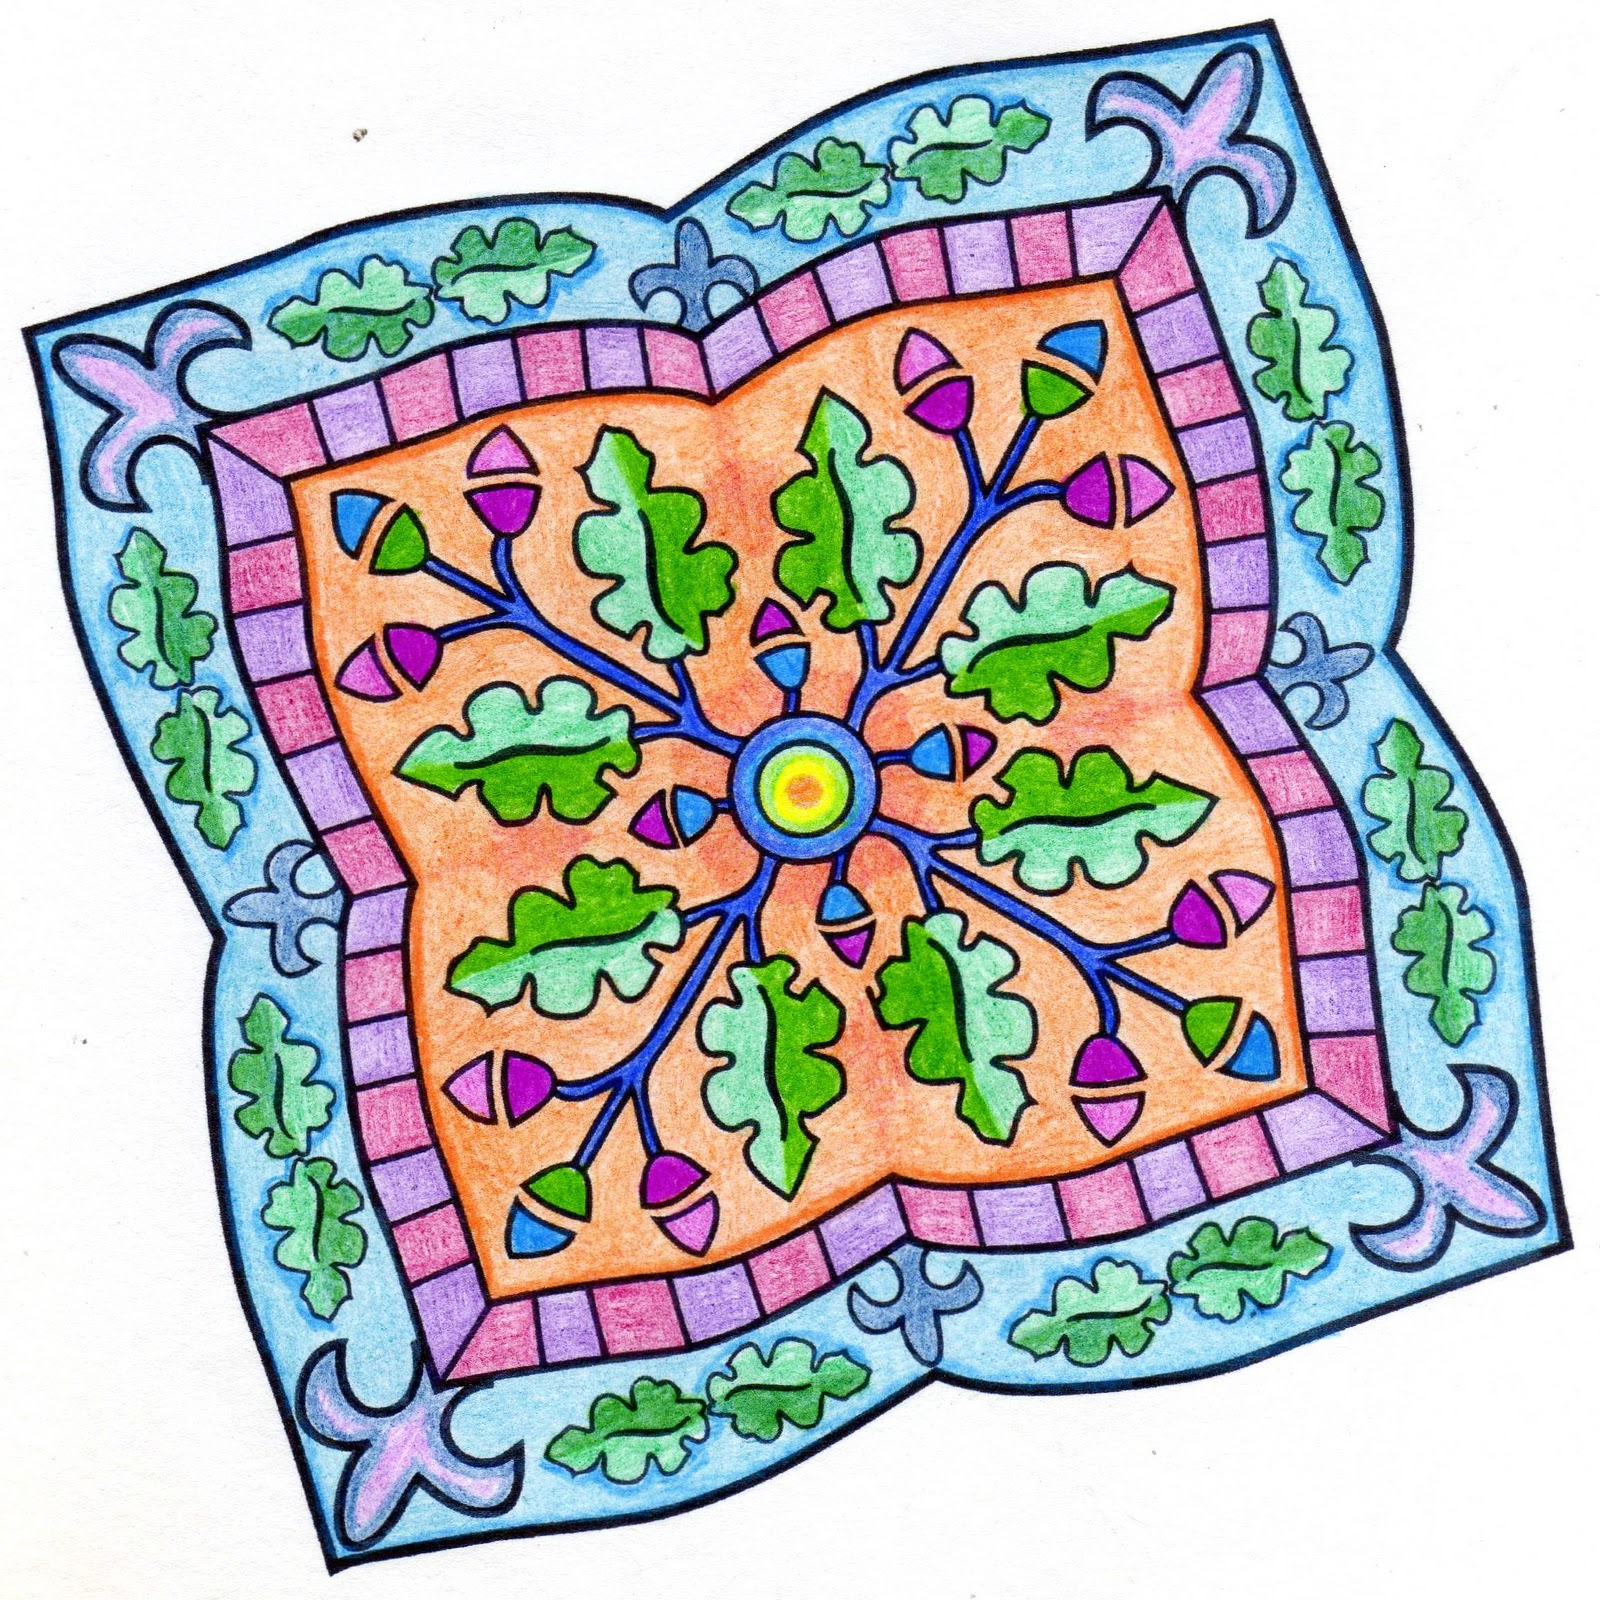 El delirio del lirium mandalas pintando dise os ajenos 1 for Disenos de mandalas